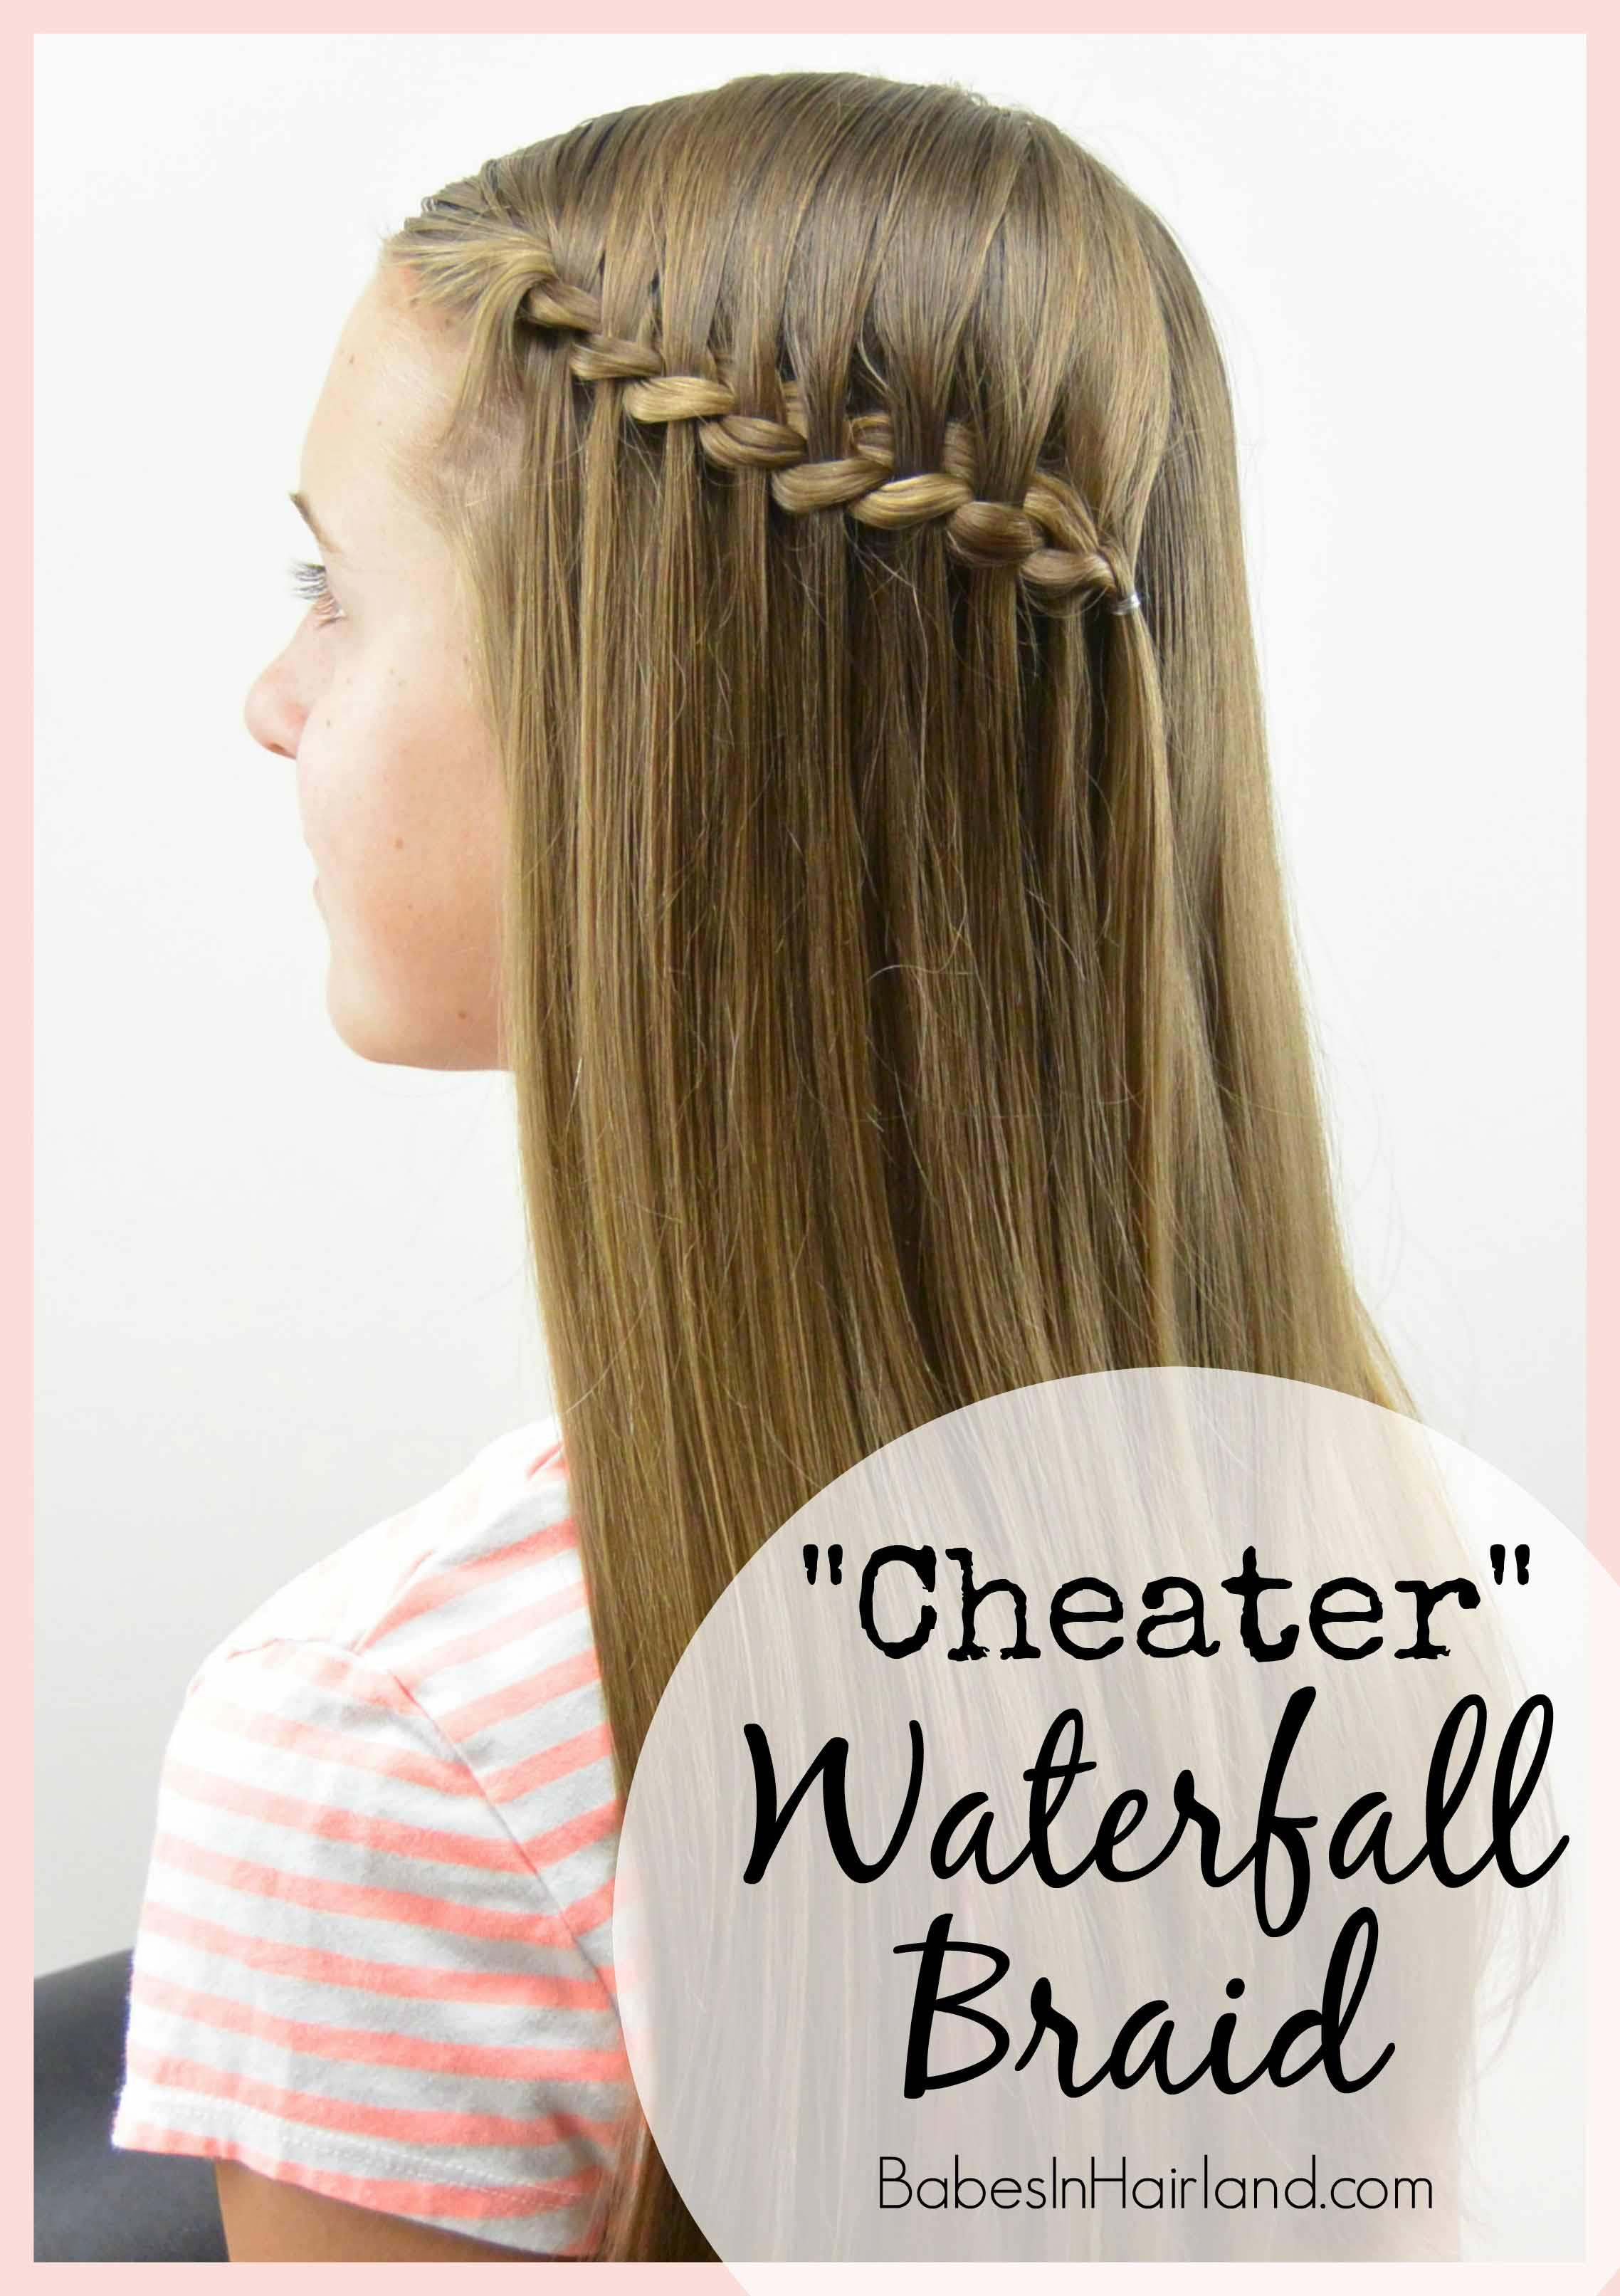 Cheater Waterfall Braid Babes In Hairland